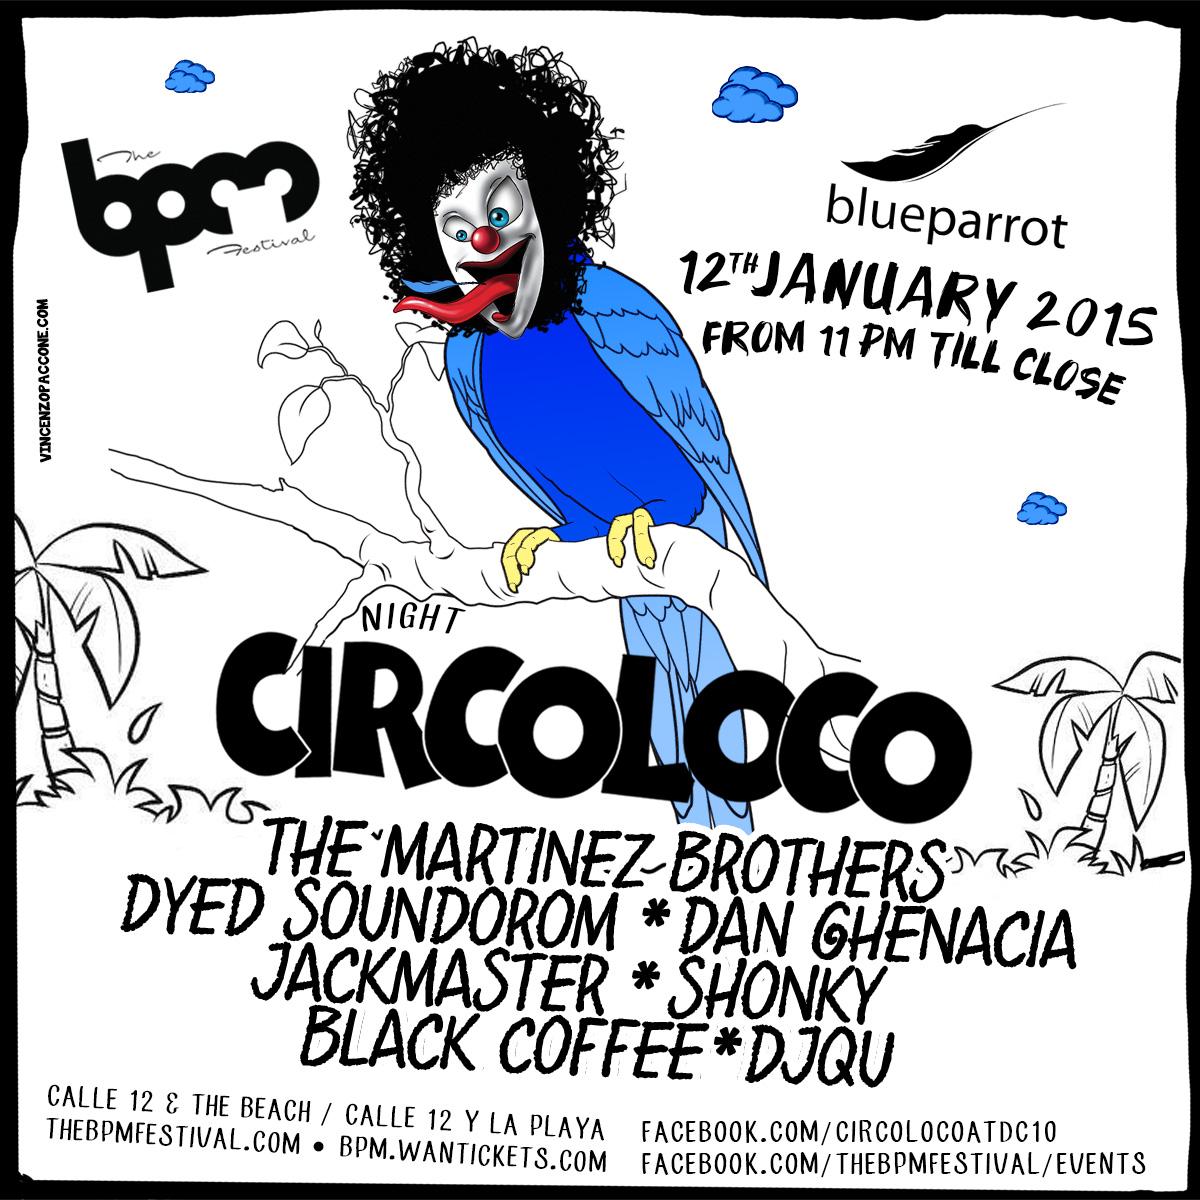 Circo Loco @ Blue Parrot - BPM 2015